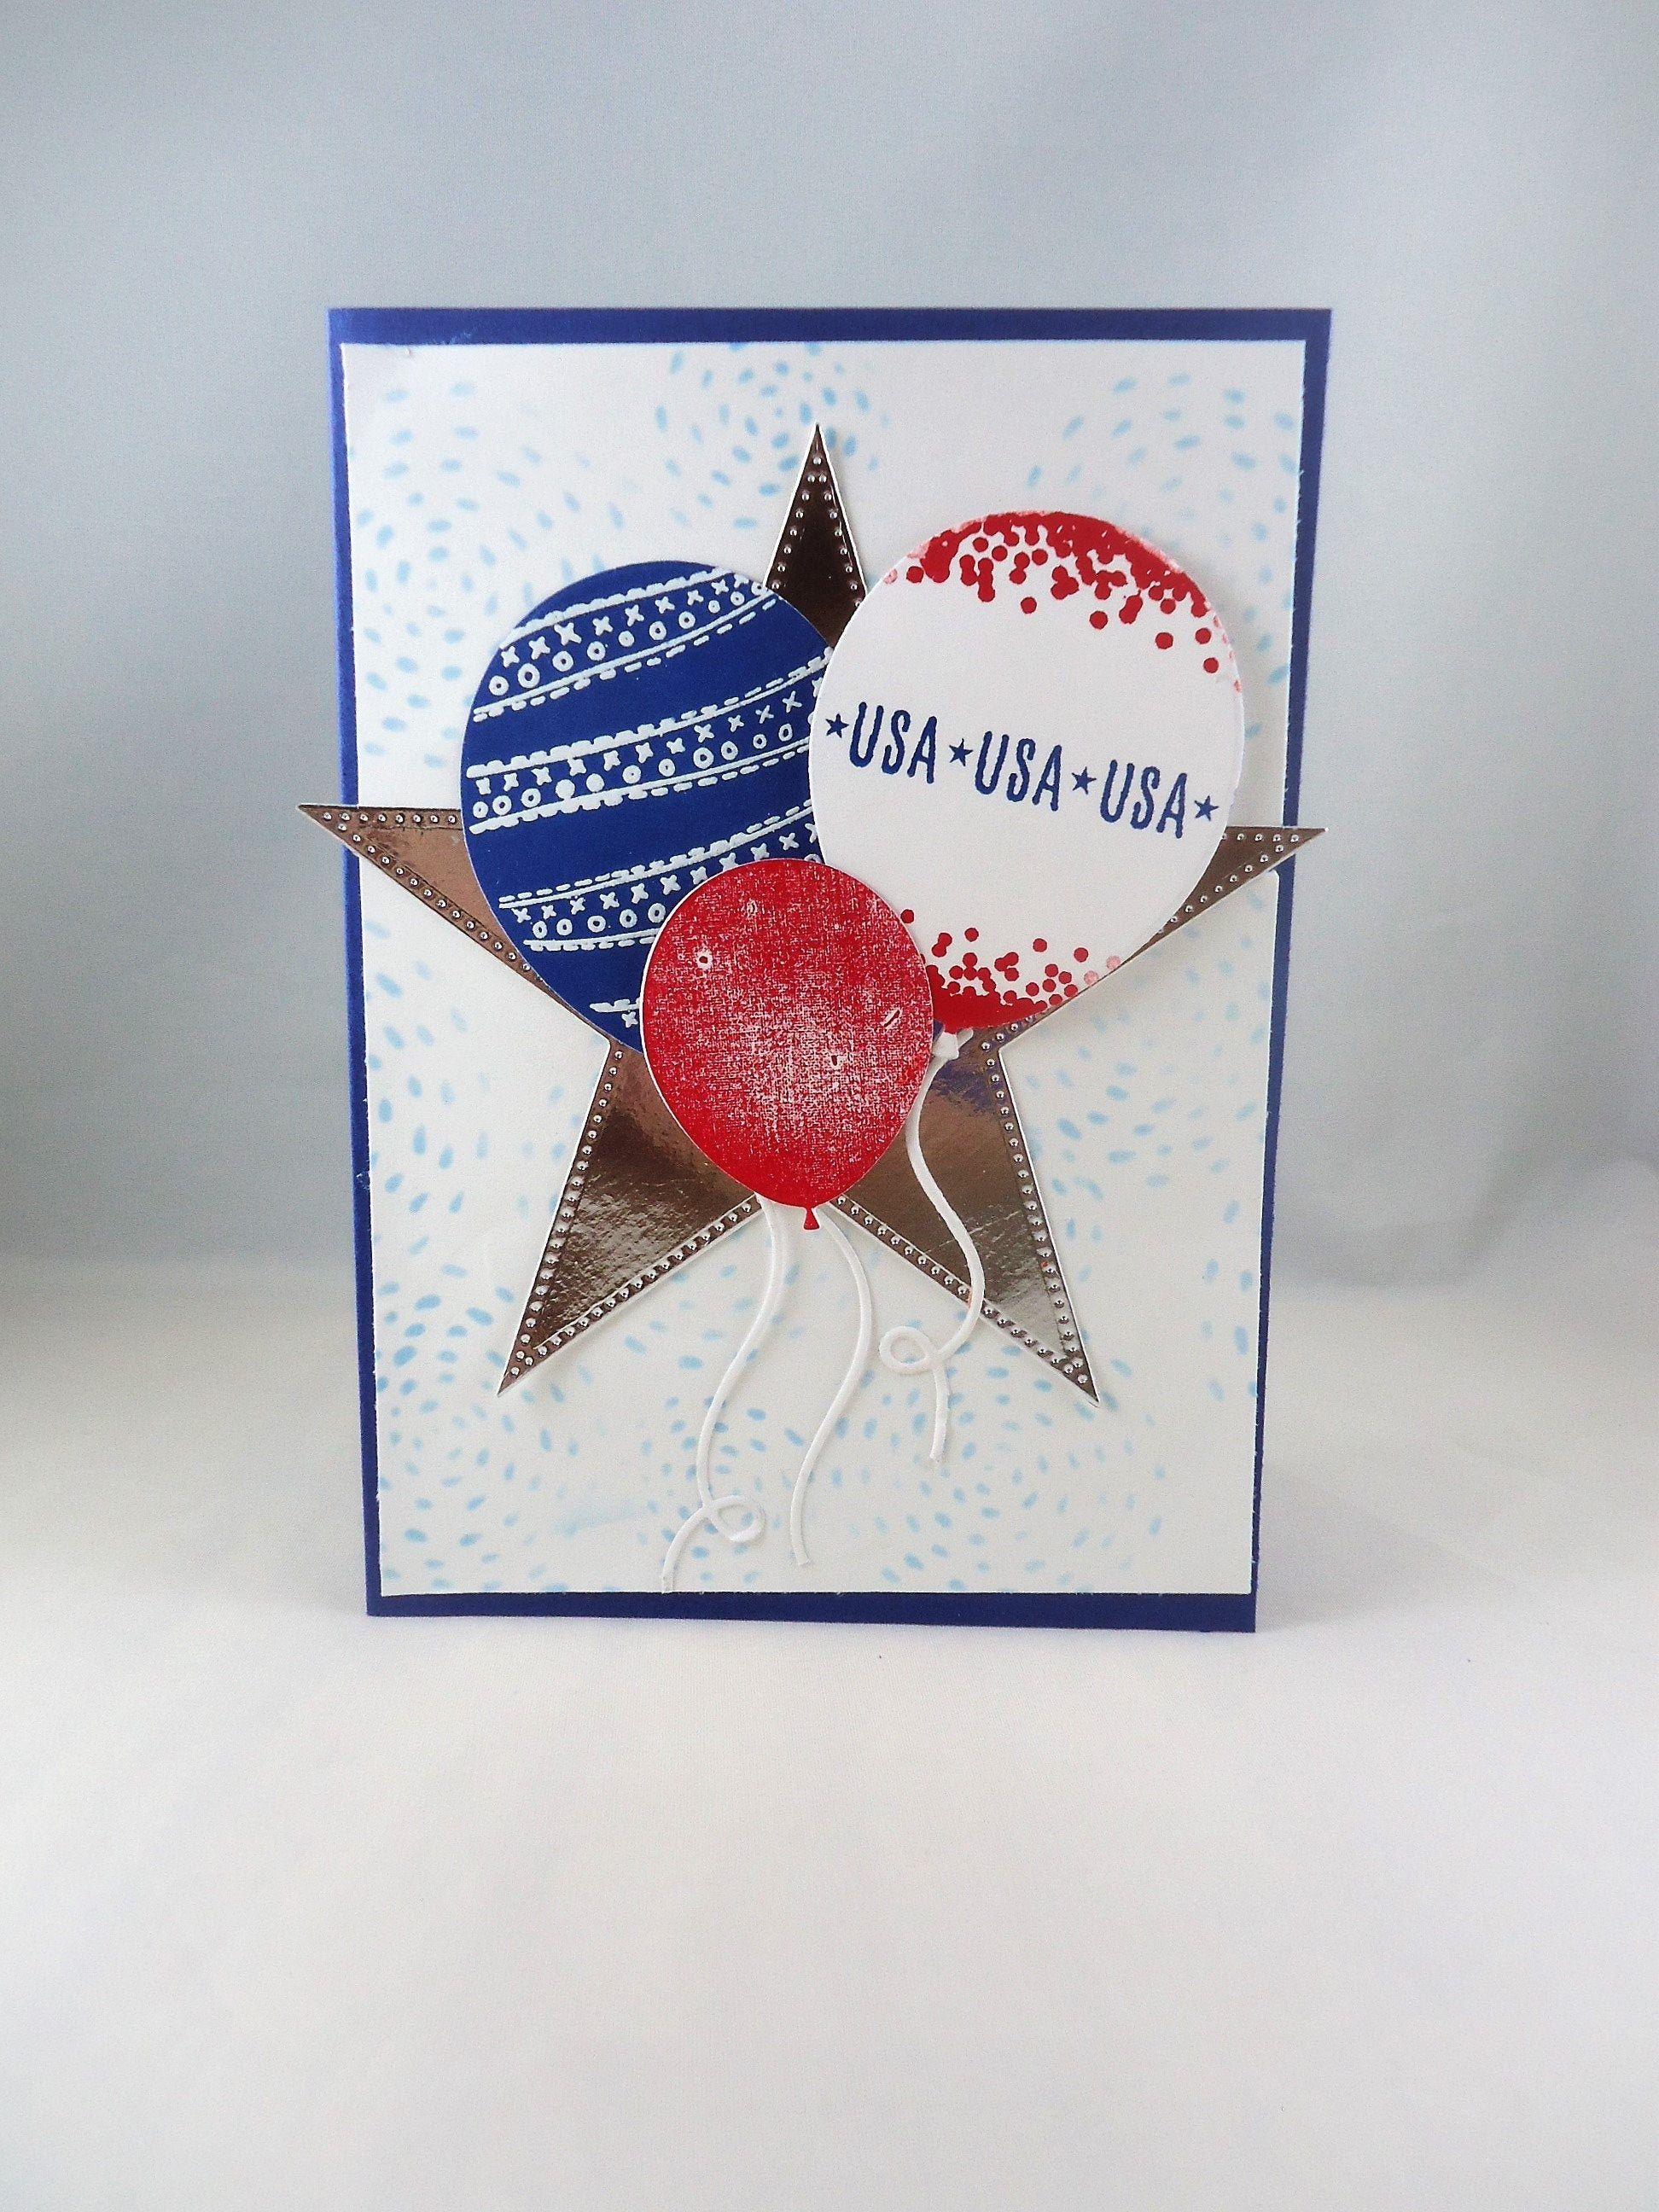 Celebrate Usa Handmade Card Red White Blue Balloon Card Etsy Cards Handmade Handmade Birthday Cards Greeting Cards Handmade